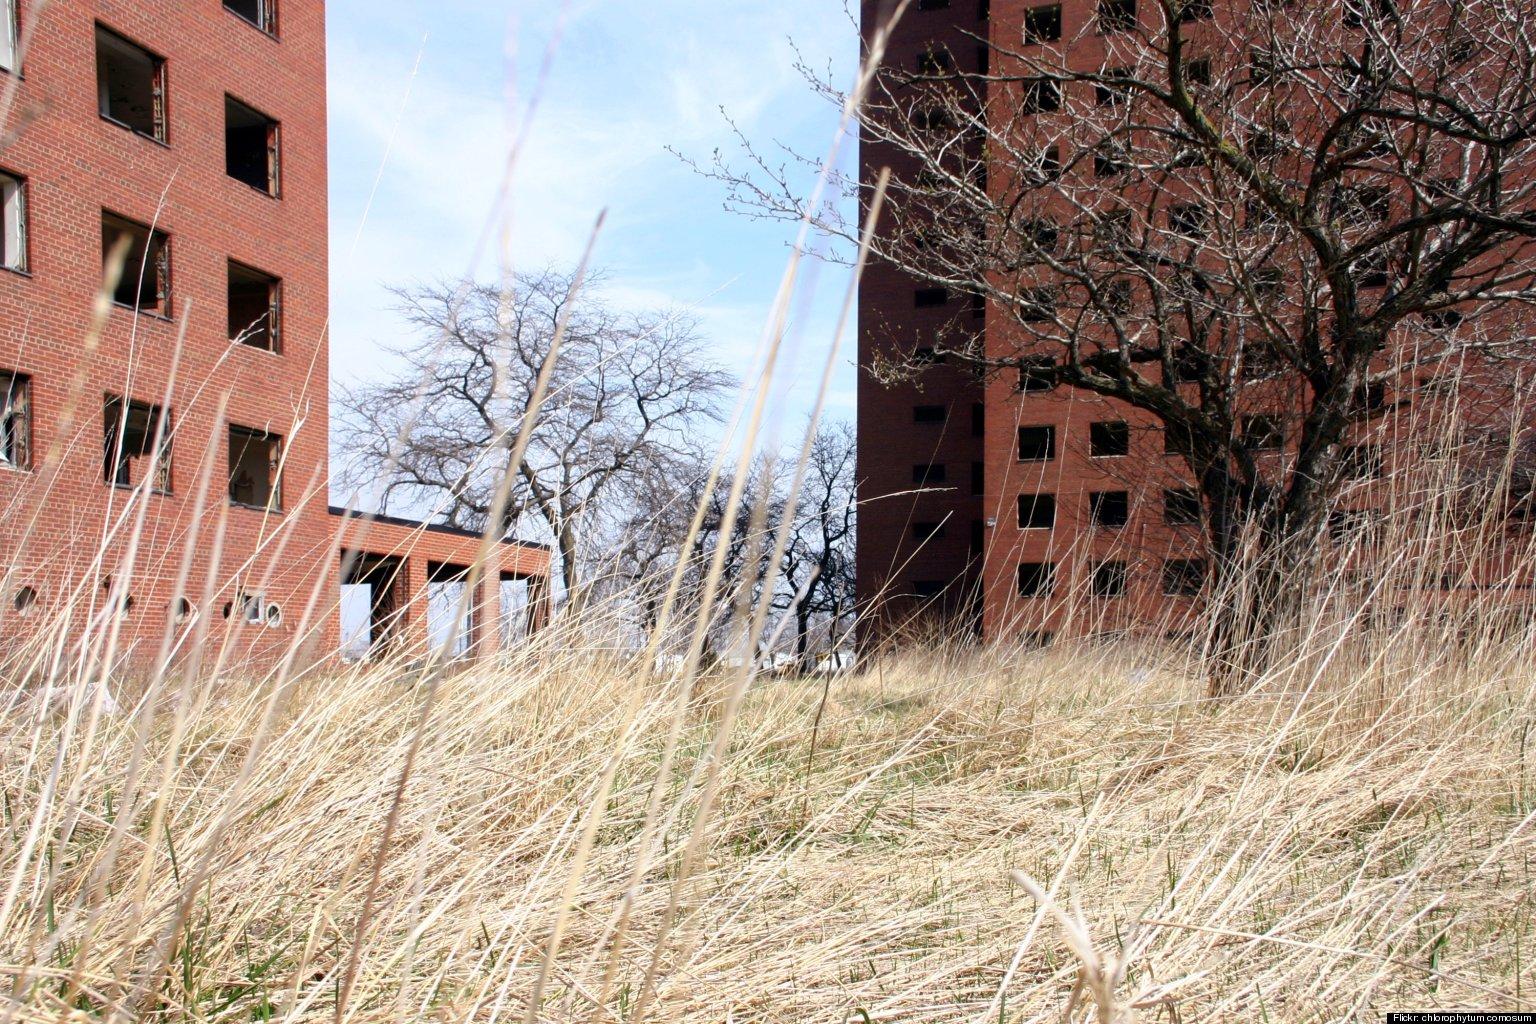 brewster douglass projects vacant detroit housing complex awarded  million  demolition